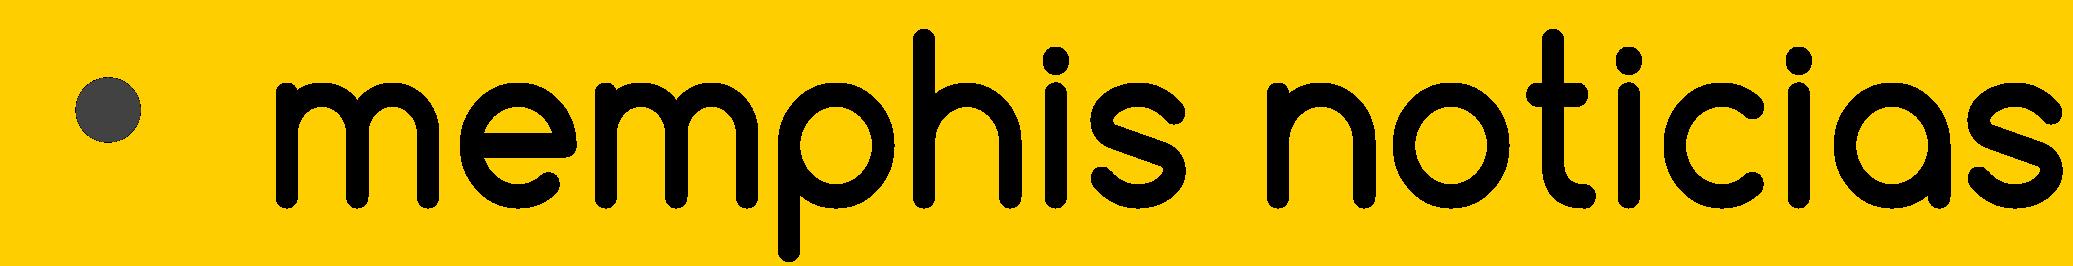 memphis noticias logo